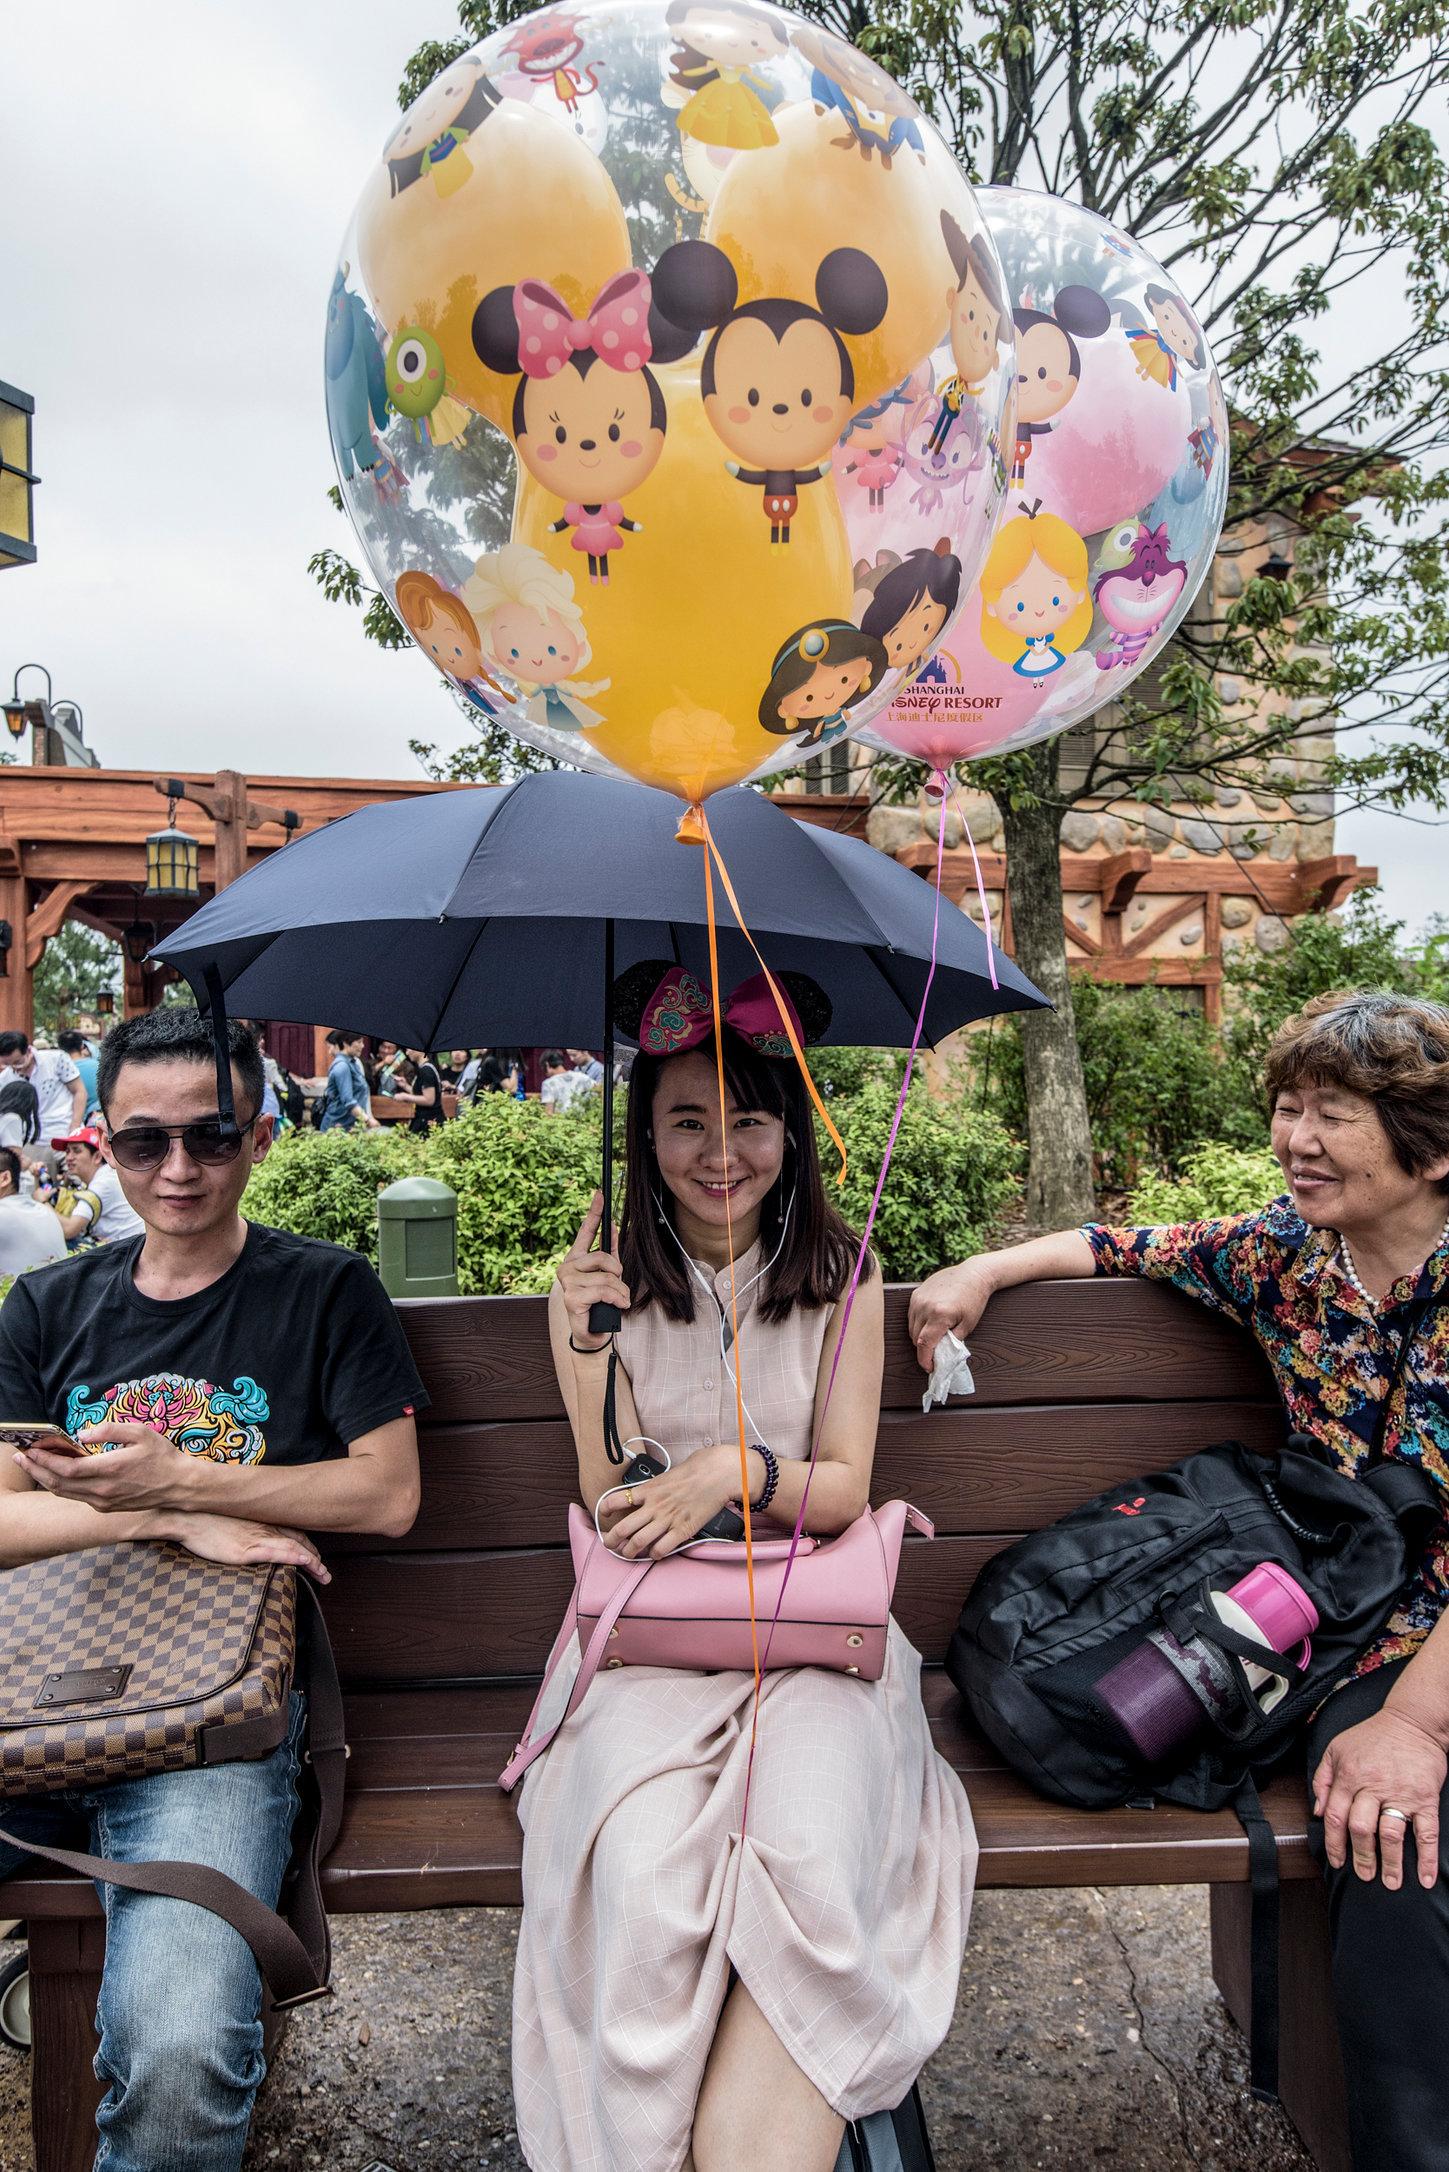 DisneylandShanghai0051.jpg